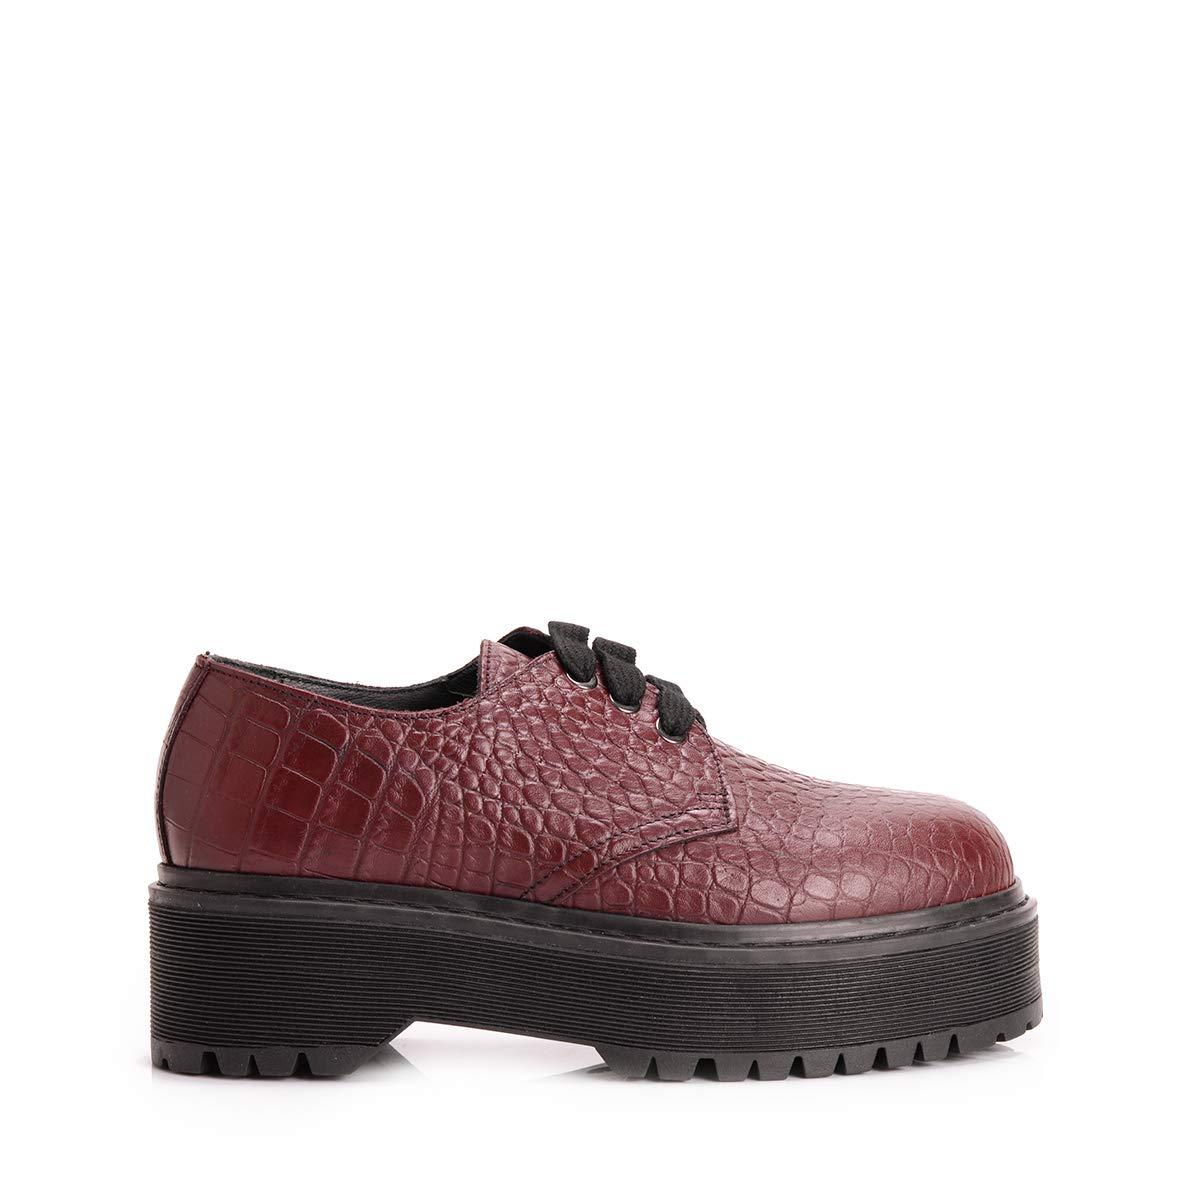 PINKO Schuhe Montgomery 1P20KN.Y1WB - Montgomery Schuhe / 1P20KN.Y1WB Montgomery - SIZE: 40(EU) - c50c1a